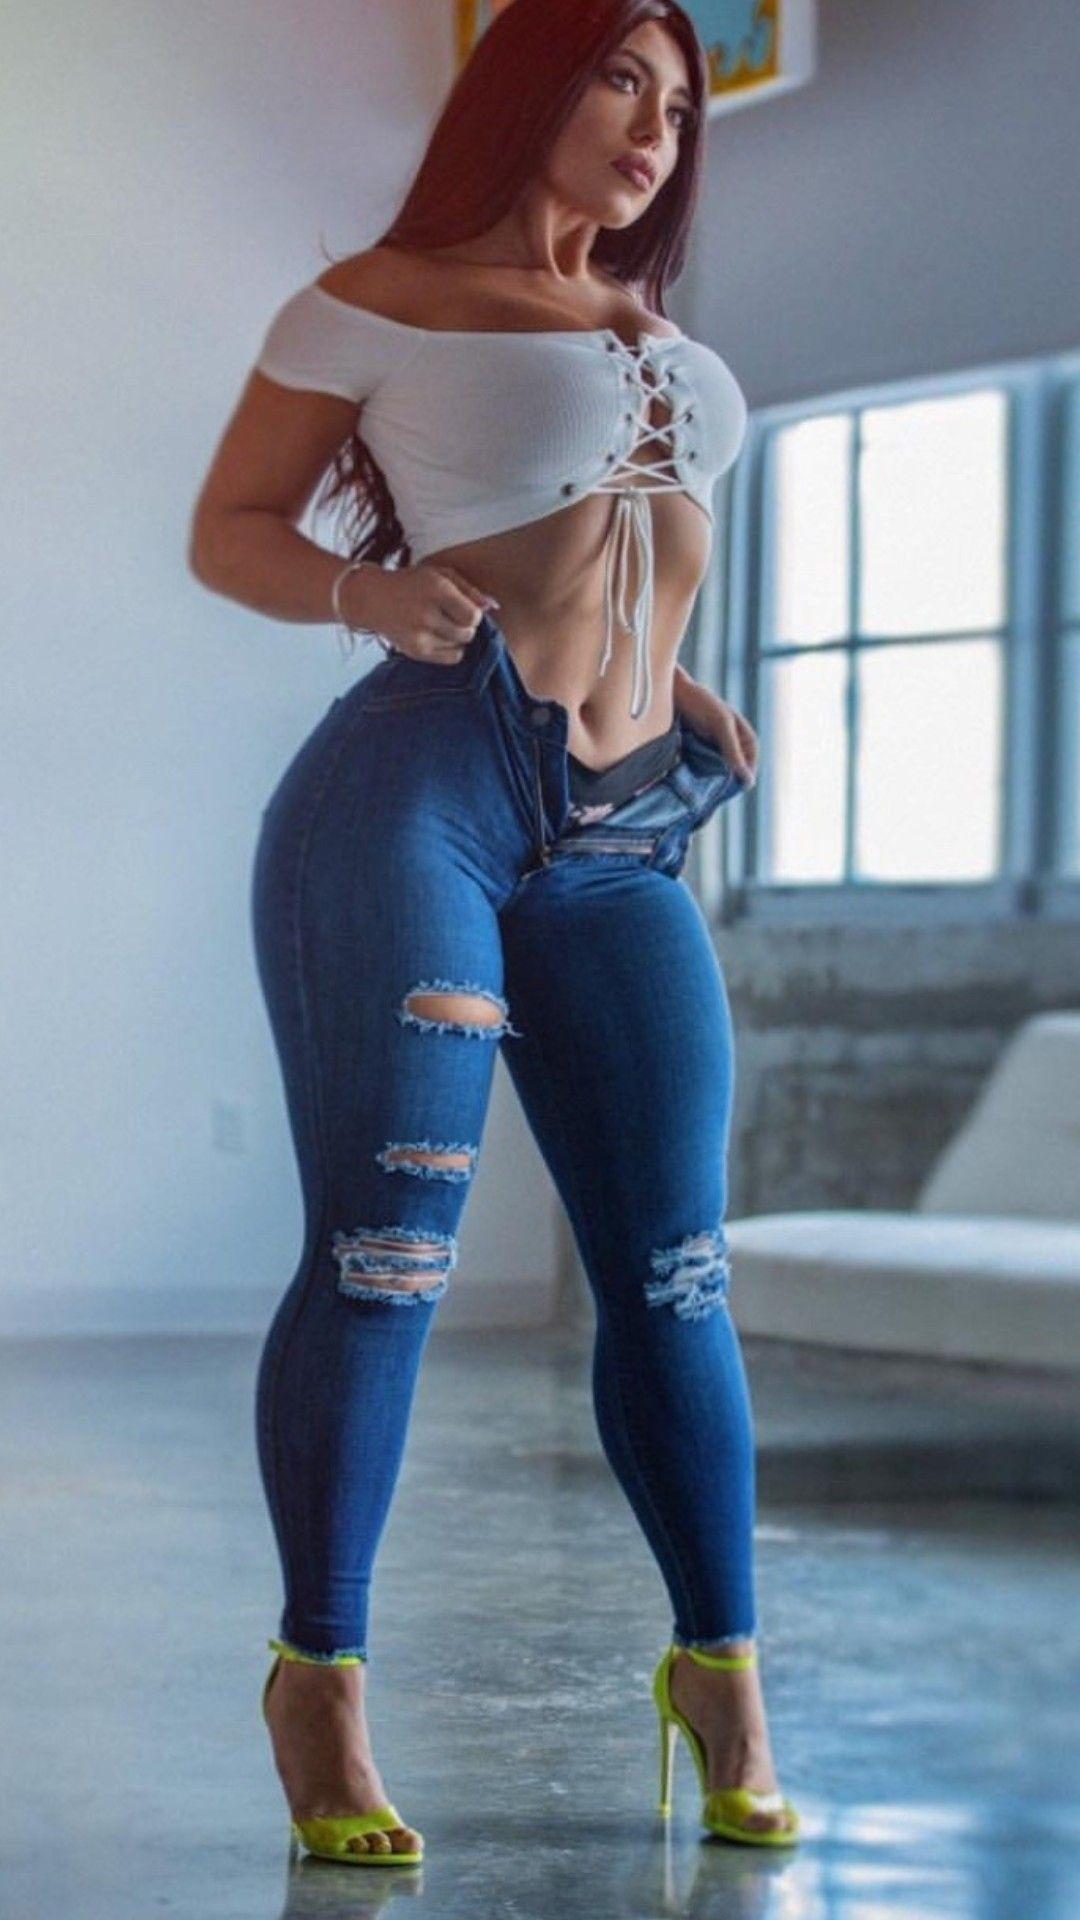 imagenes de chicas sexis 2019